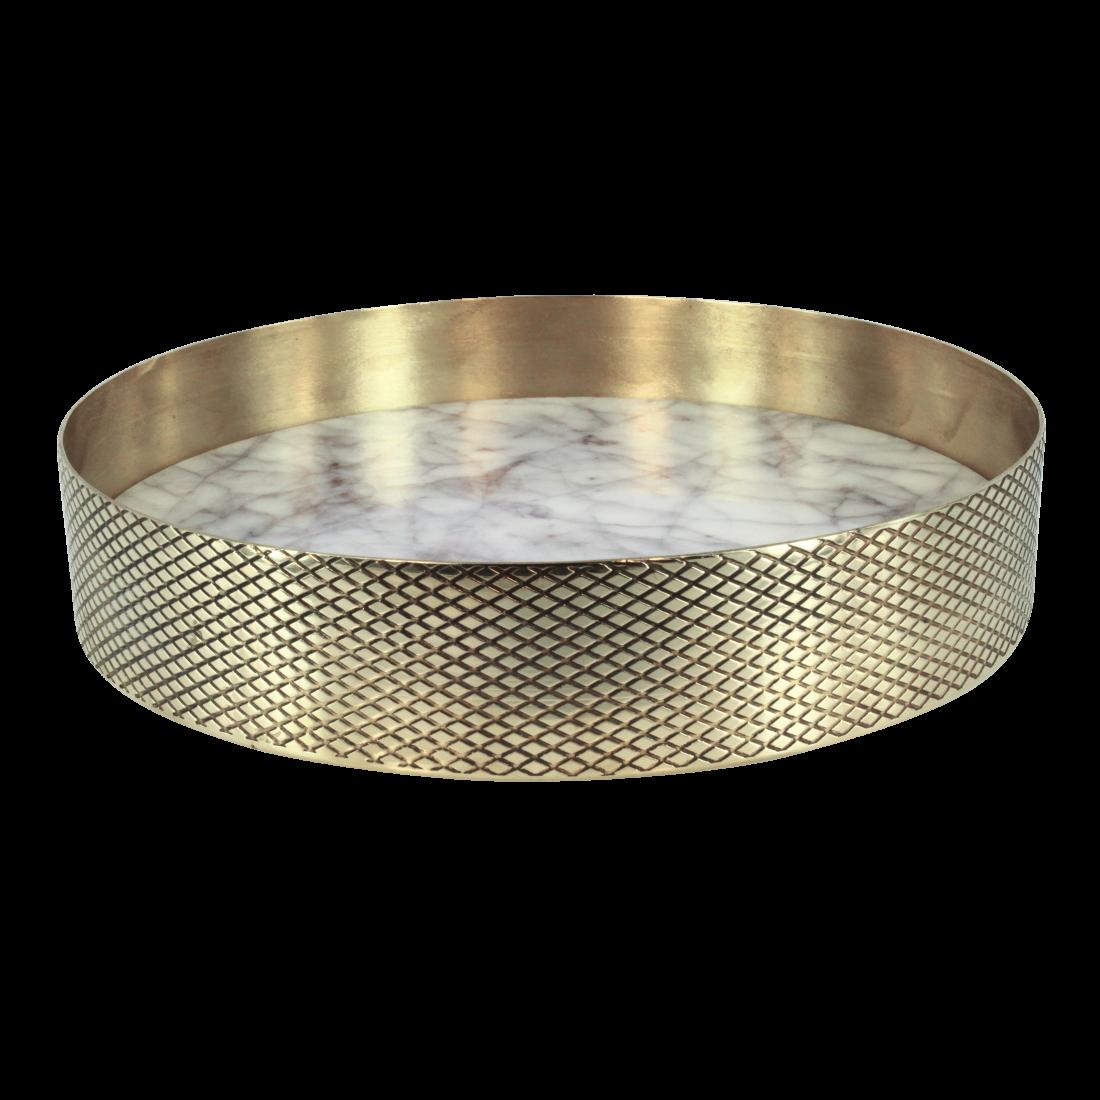 The-Orbit-Tray-Small-Diamond-brassWhite-marble-small